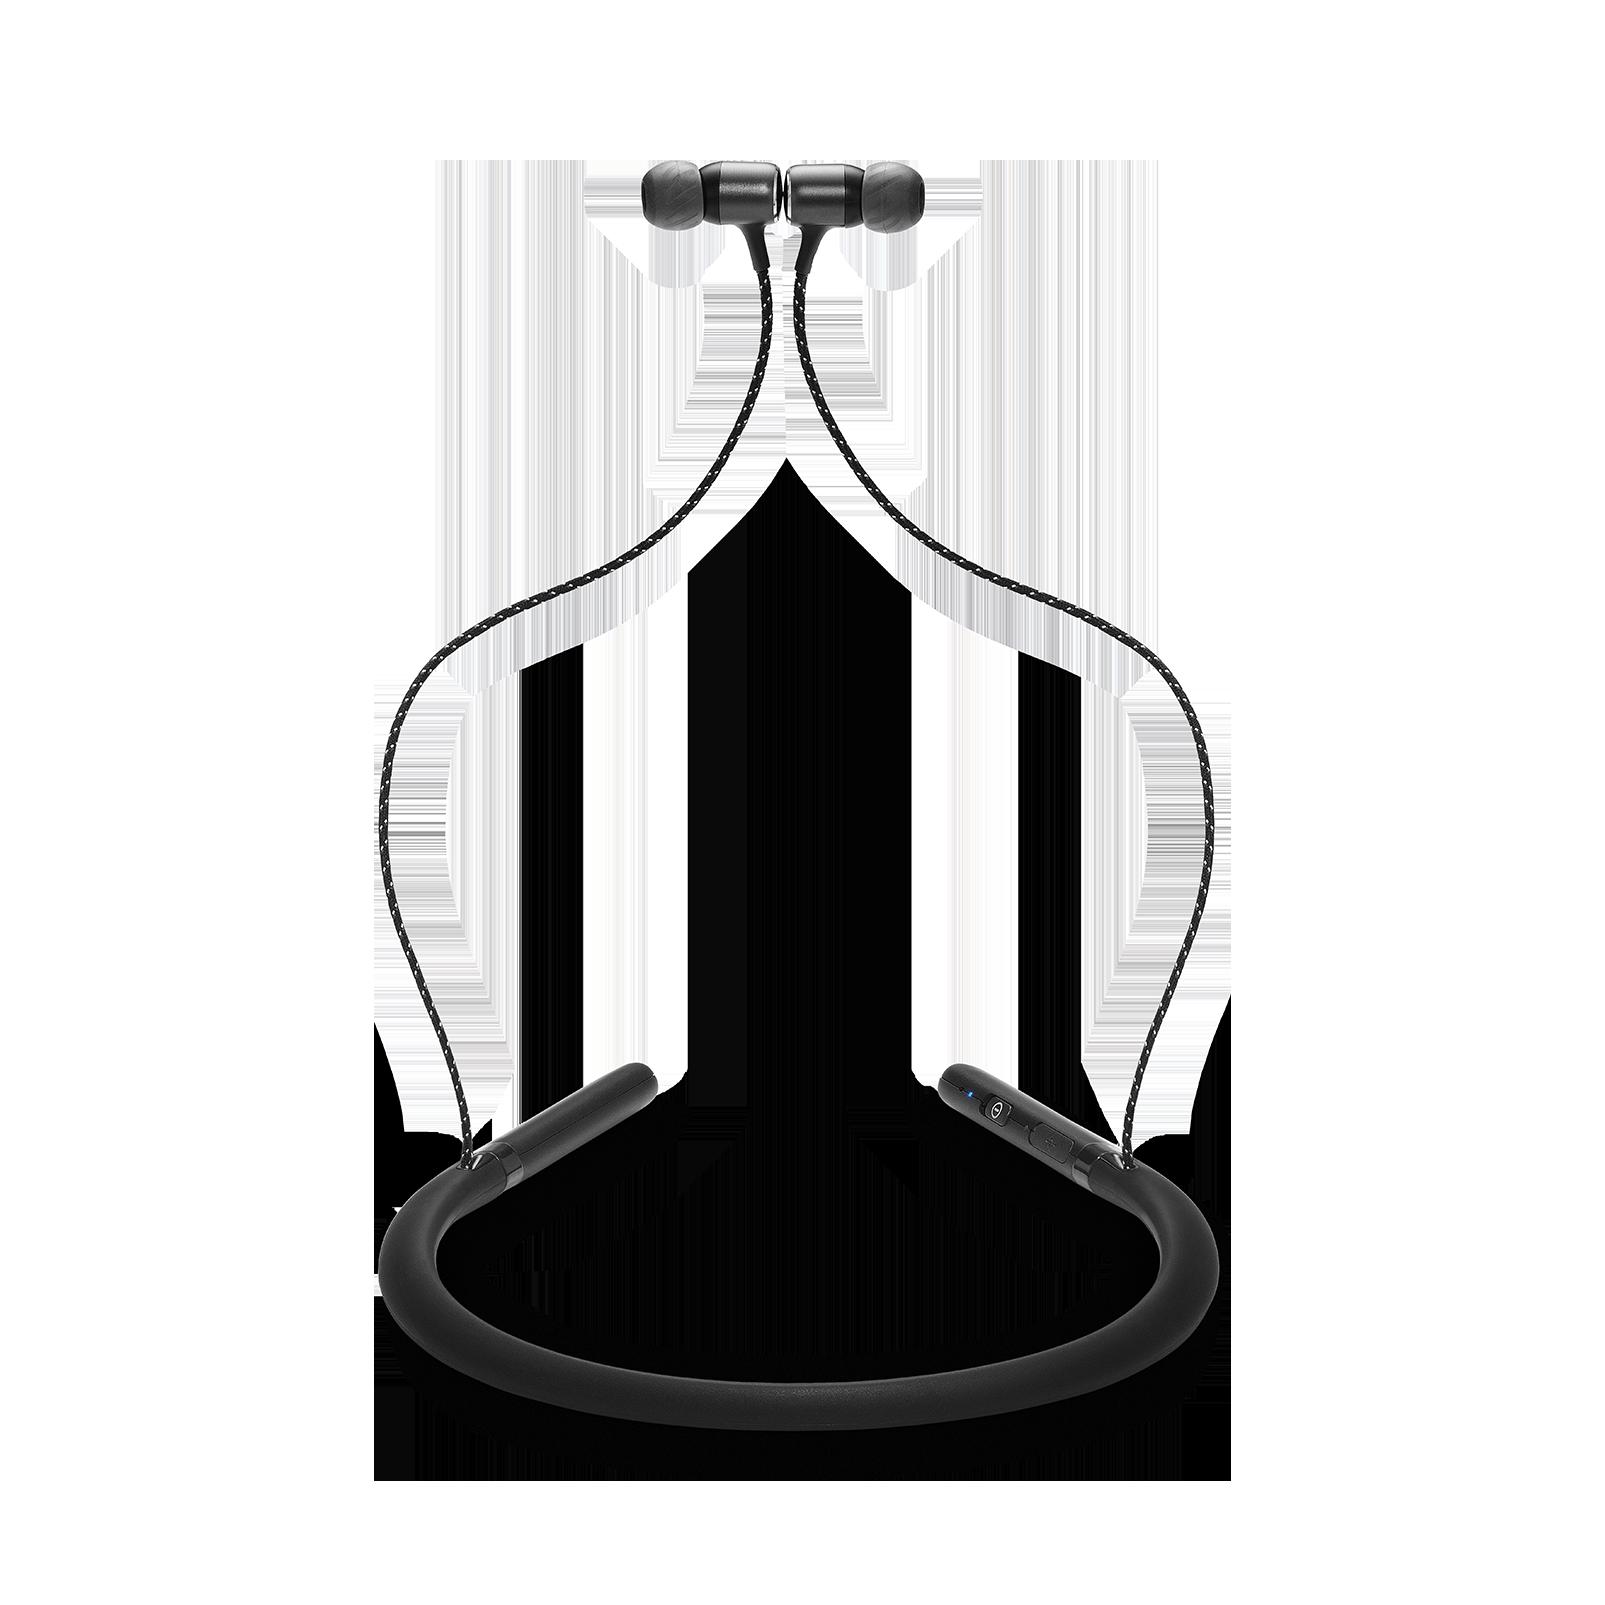 JBL LIVE 200BT - Black - Wireless in-ear neckband headphones - Detailshot 1